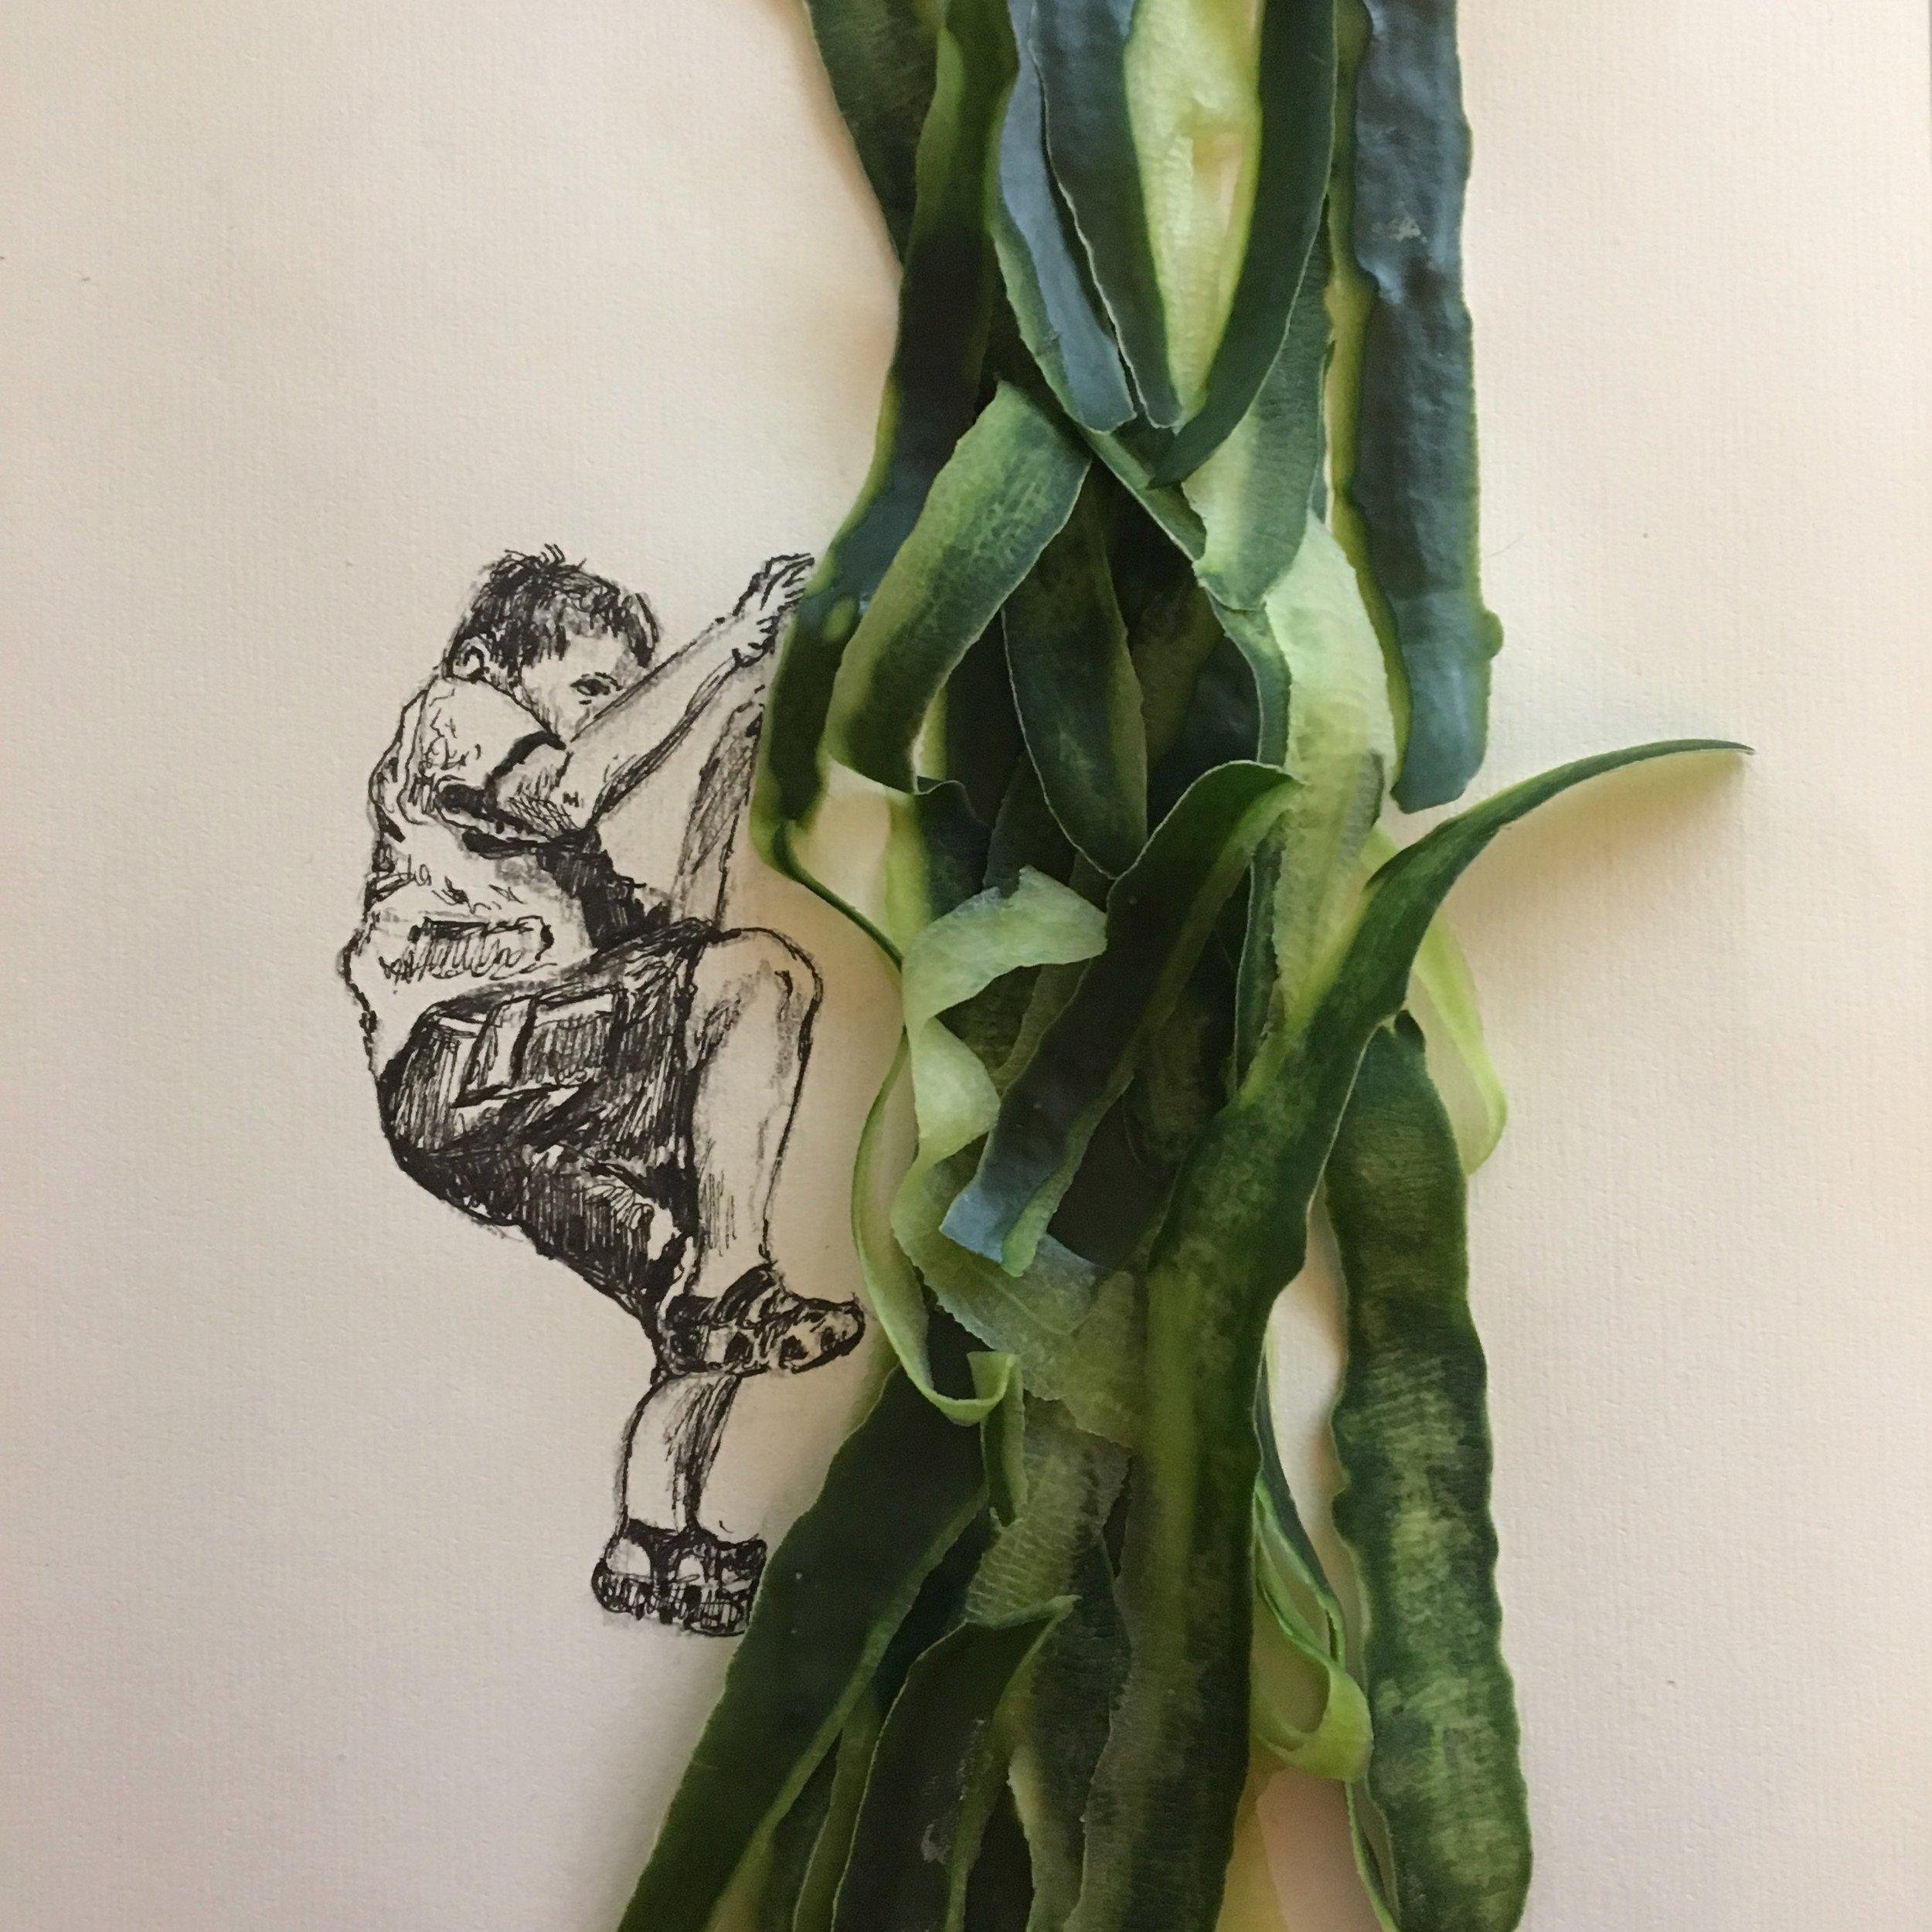 jack-and-the-bean-stallk-interactive-drawing-by-jordan-fretz-art.jpg